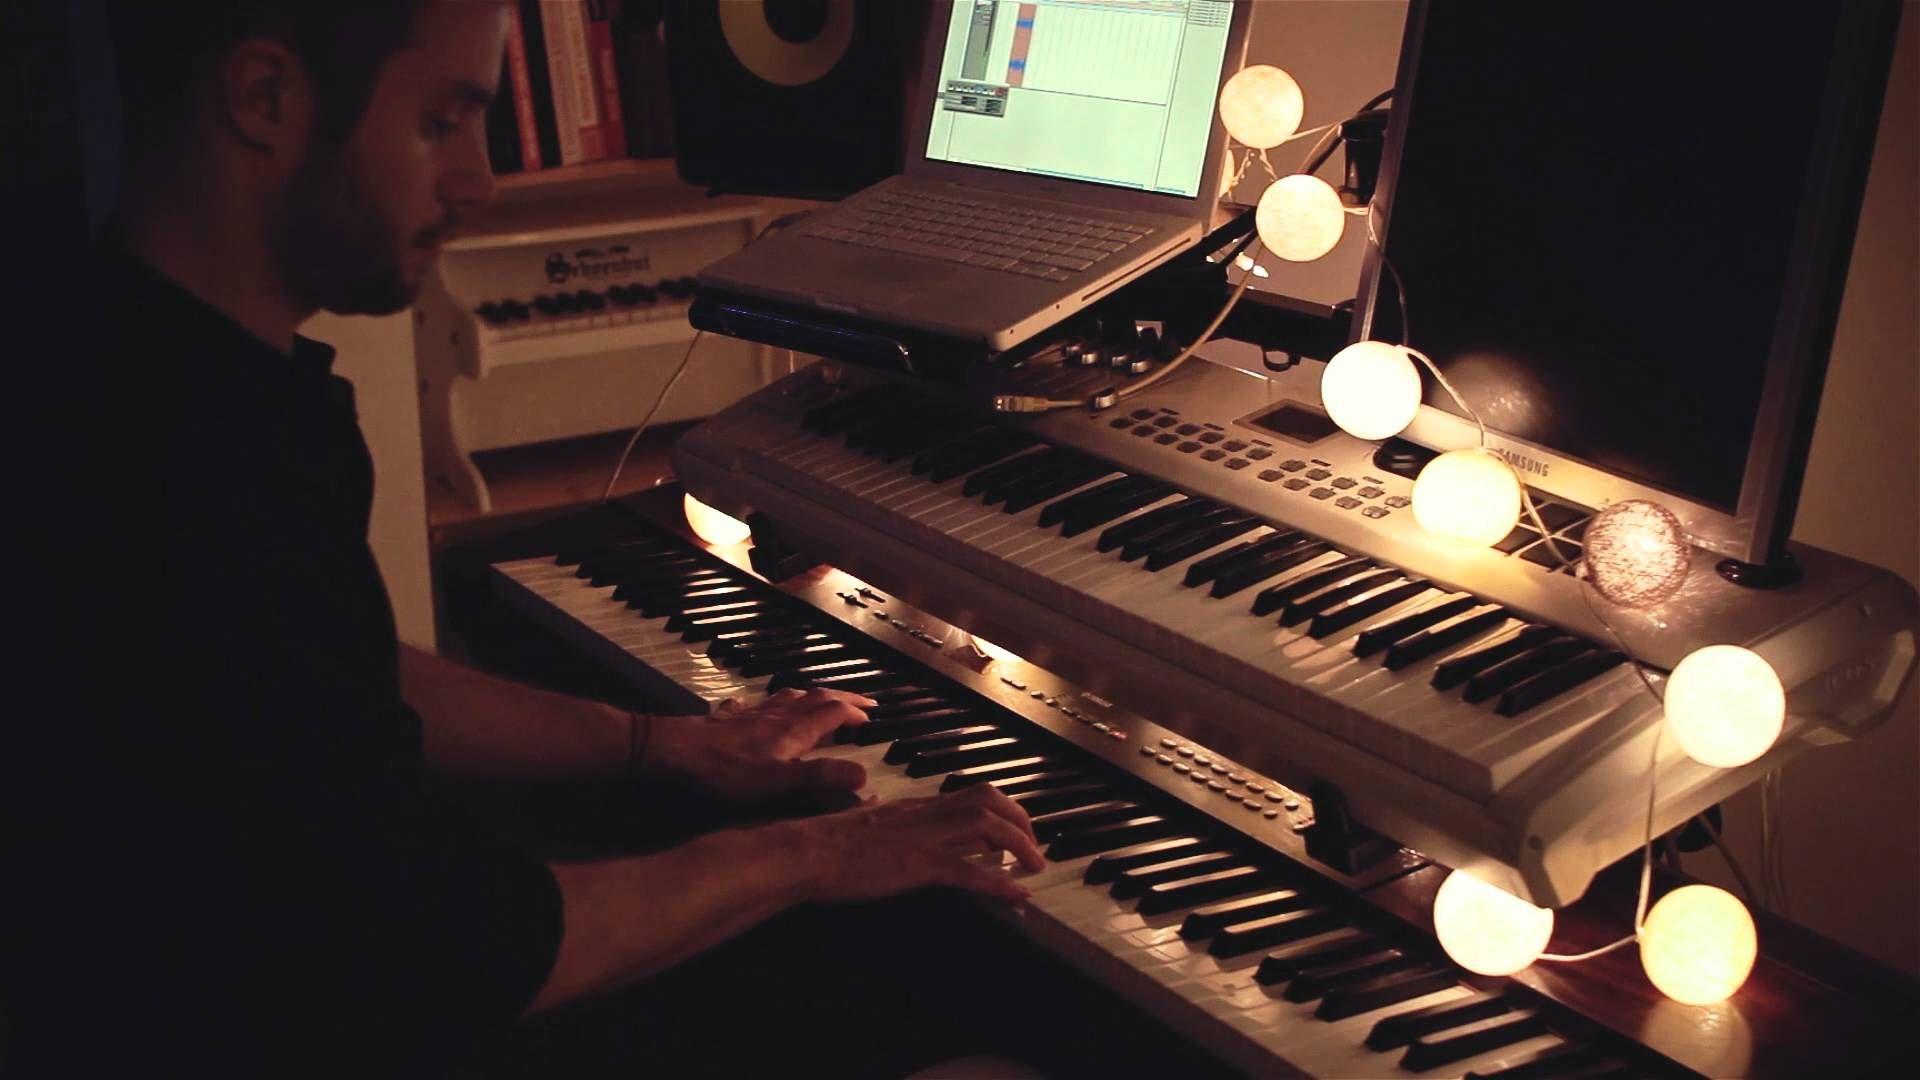 Hq Hallelujah Instrumental Piano Cover By Jacu Instrumental